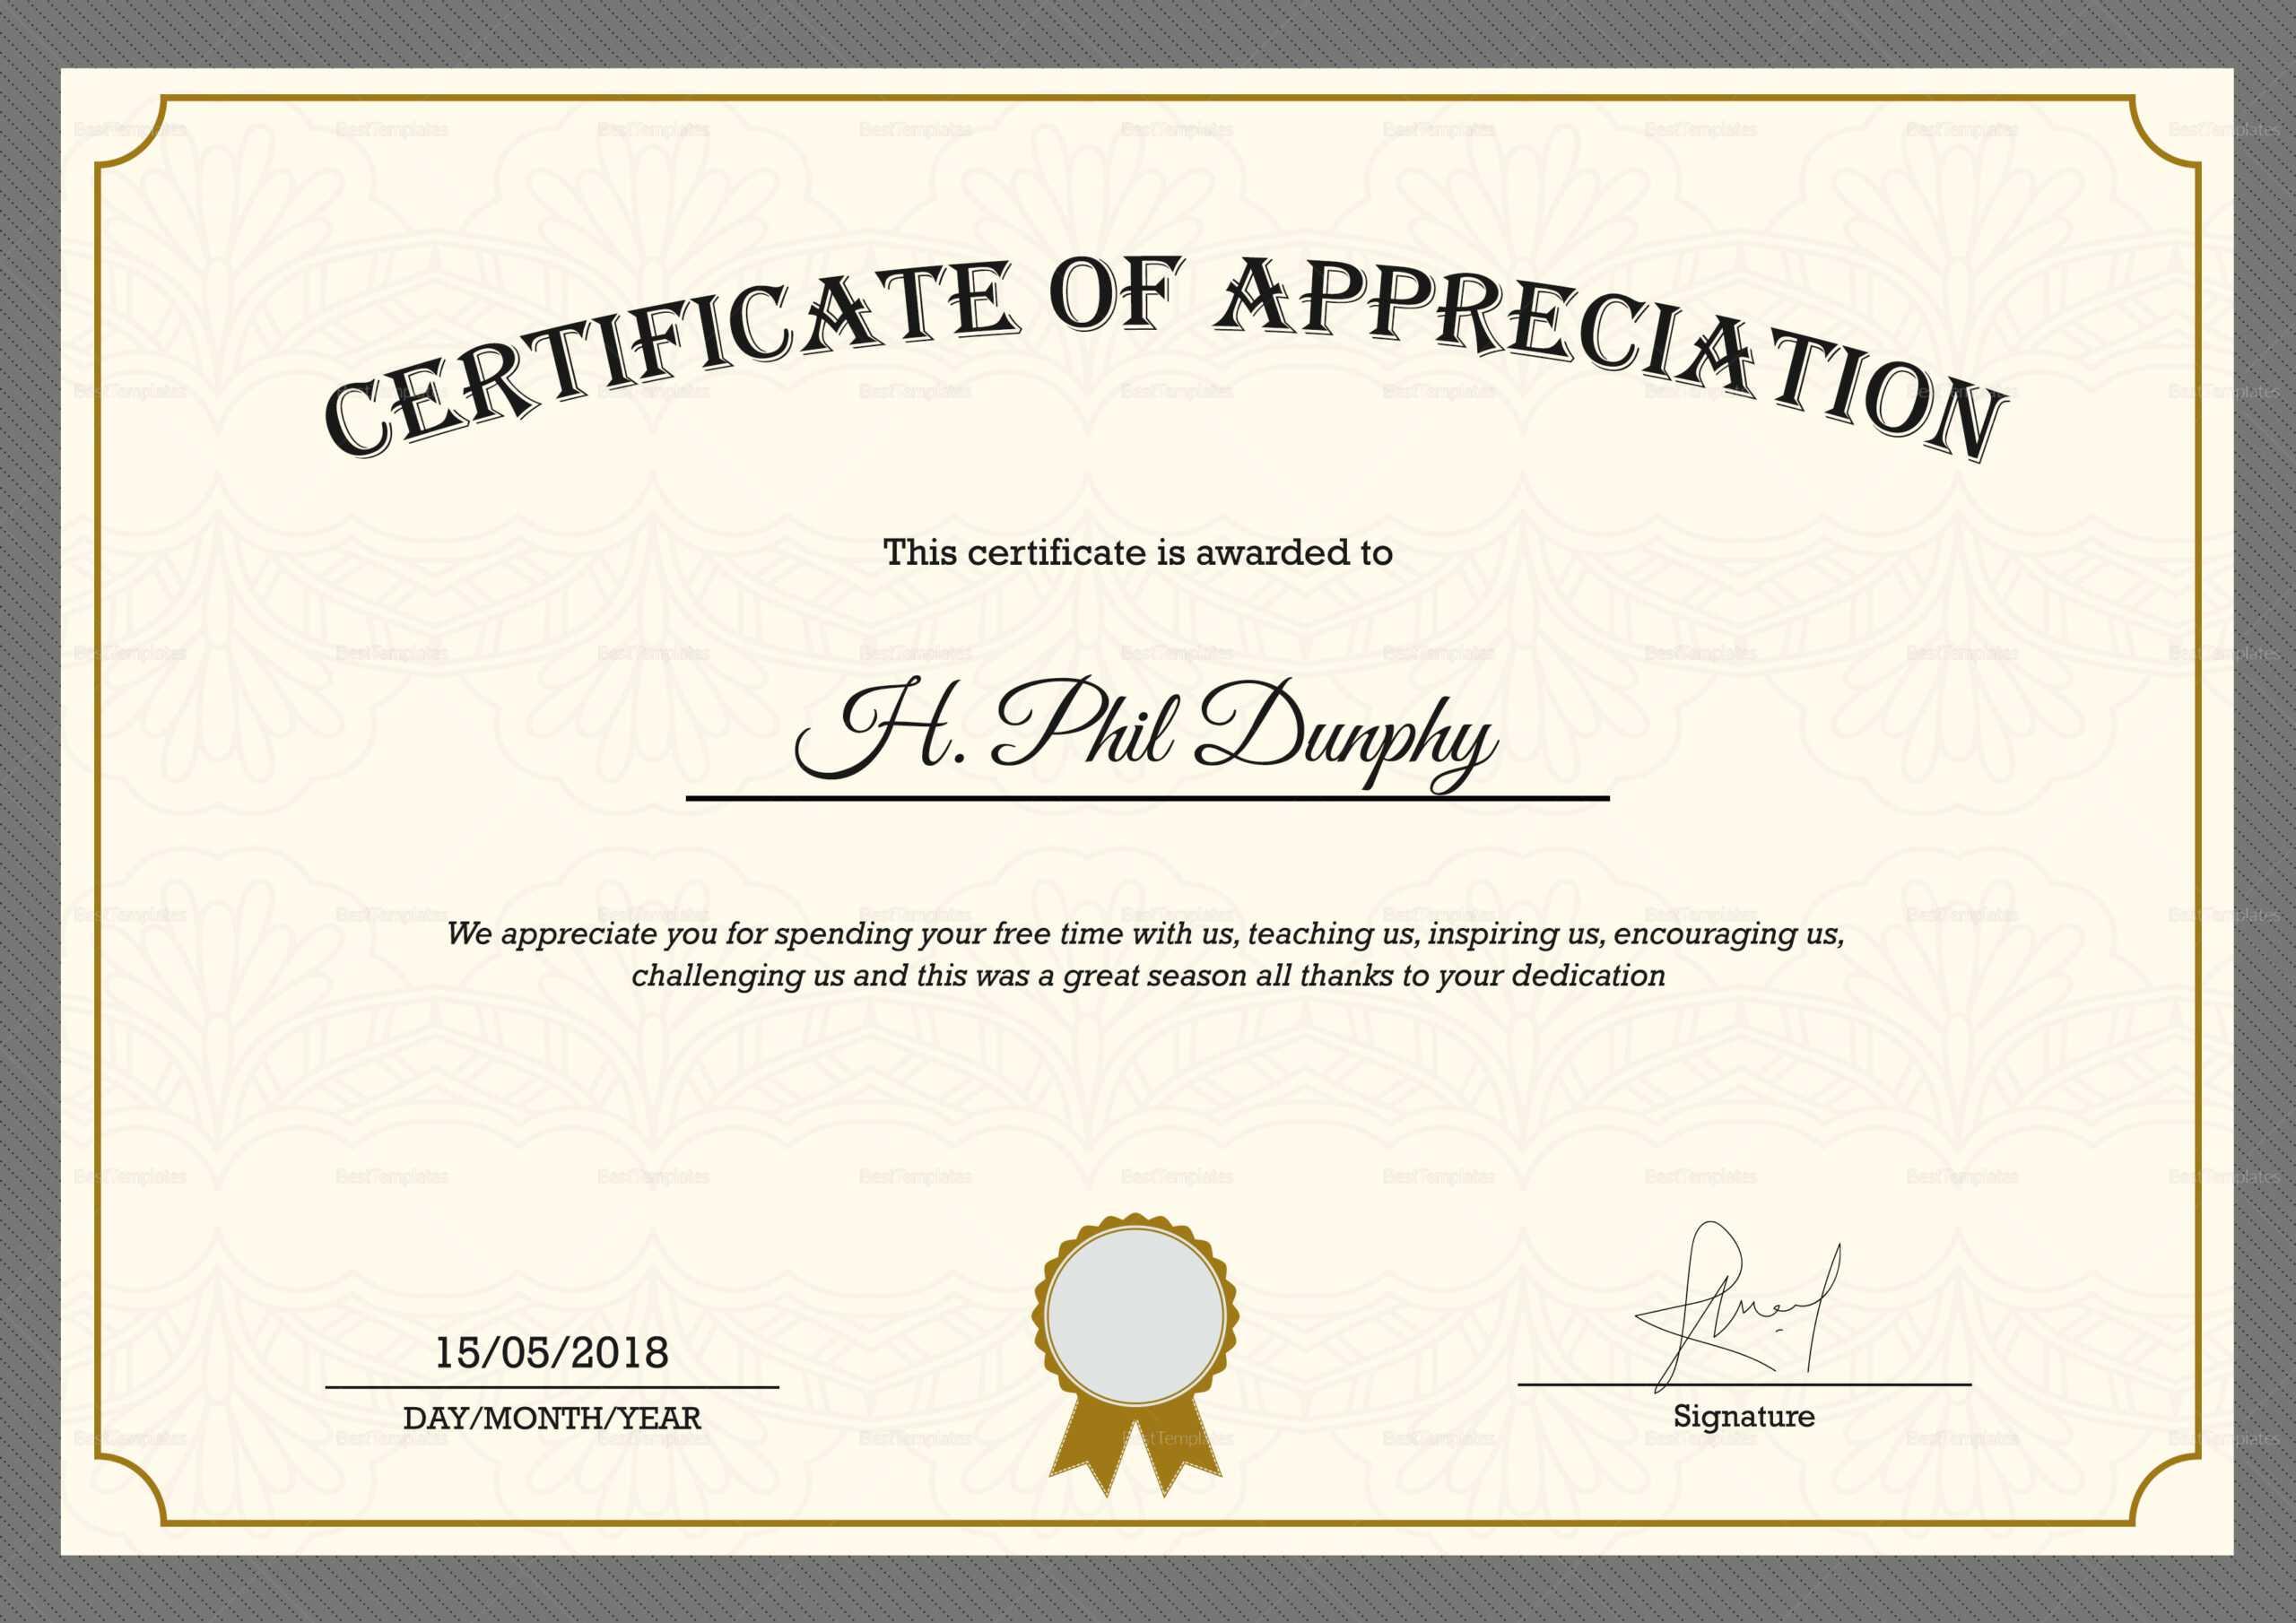 Sample Company Appreciation Certificate Template Within In Appreciation Certificate Templates